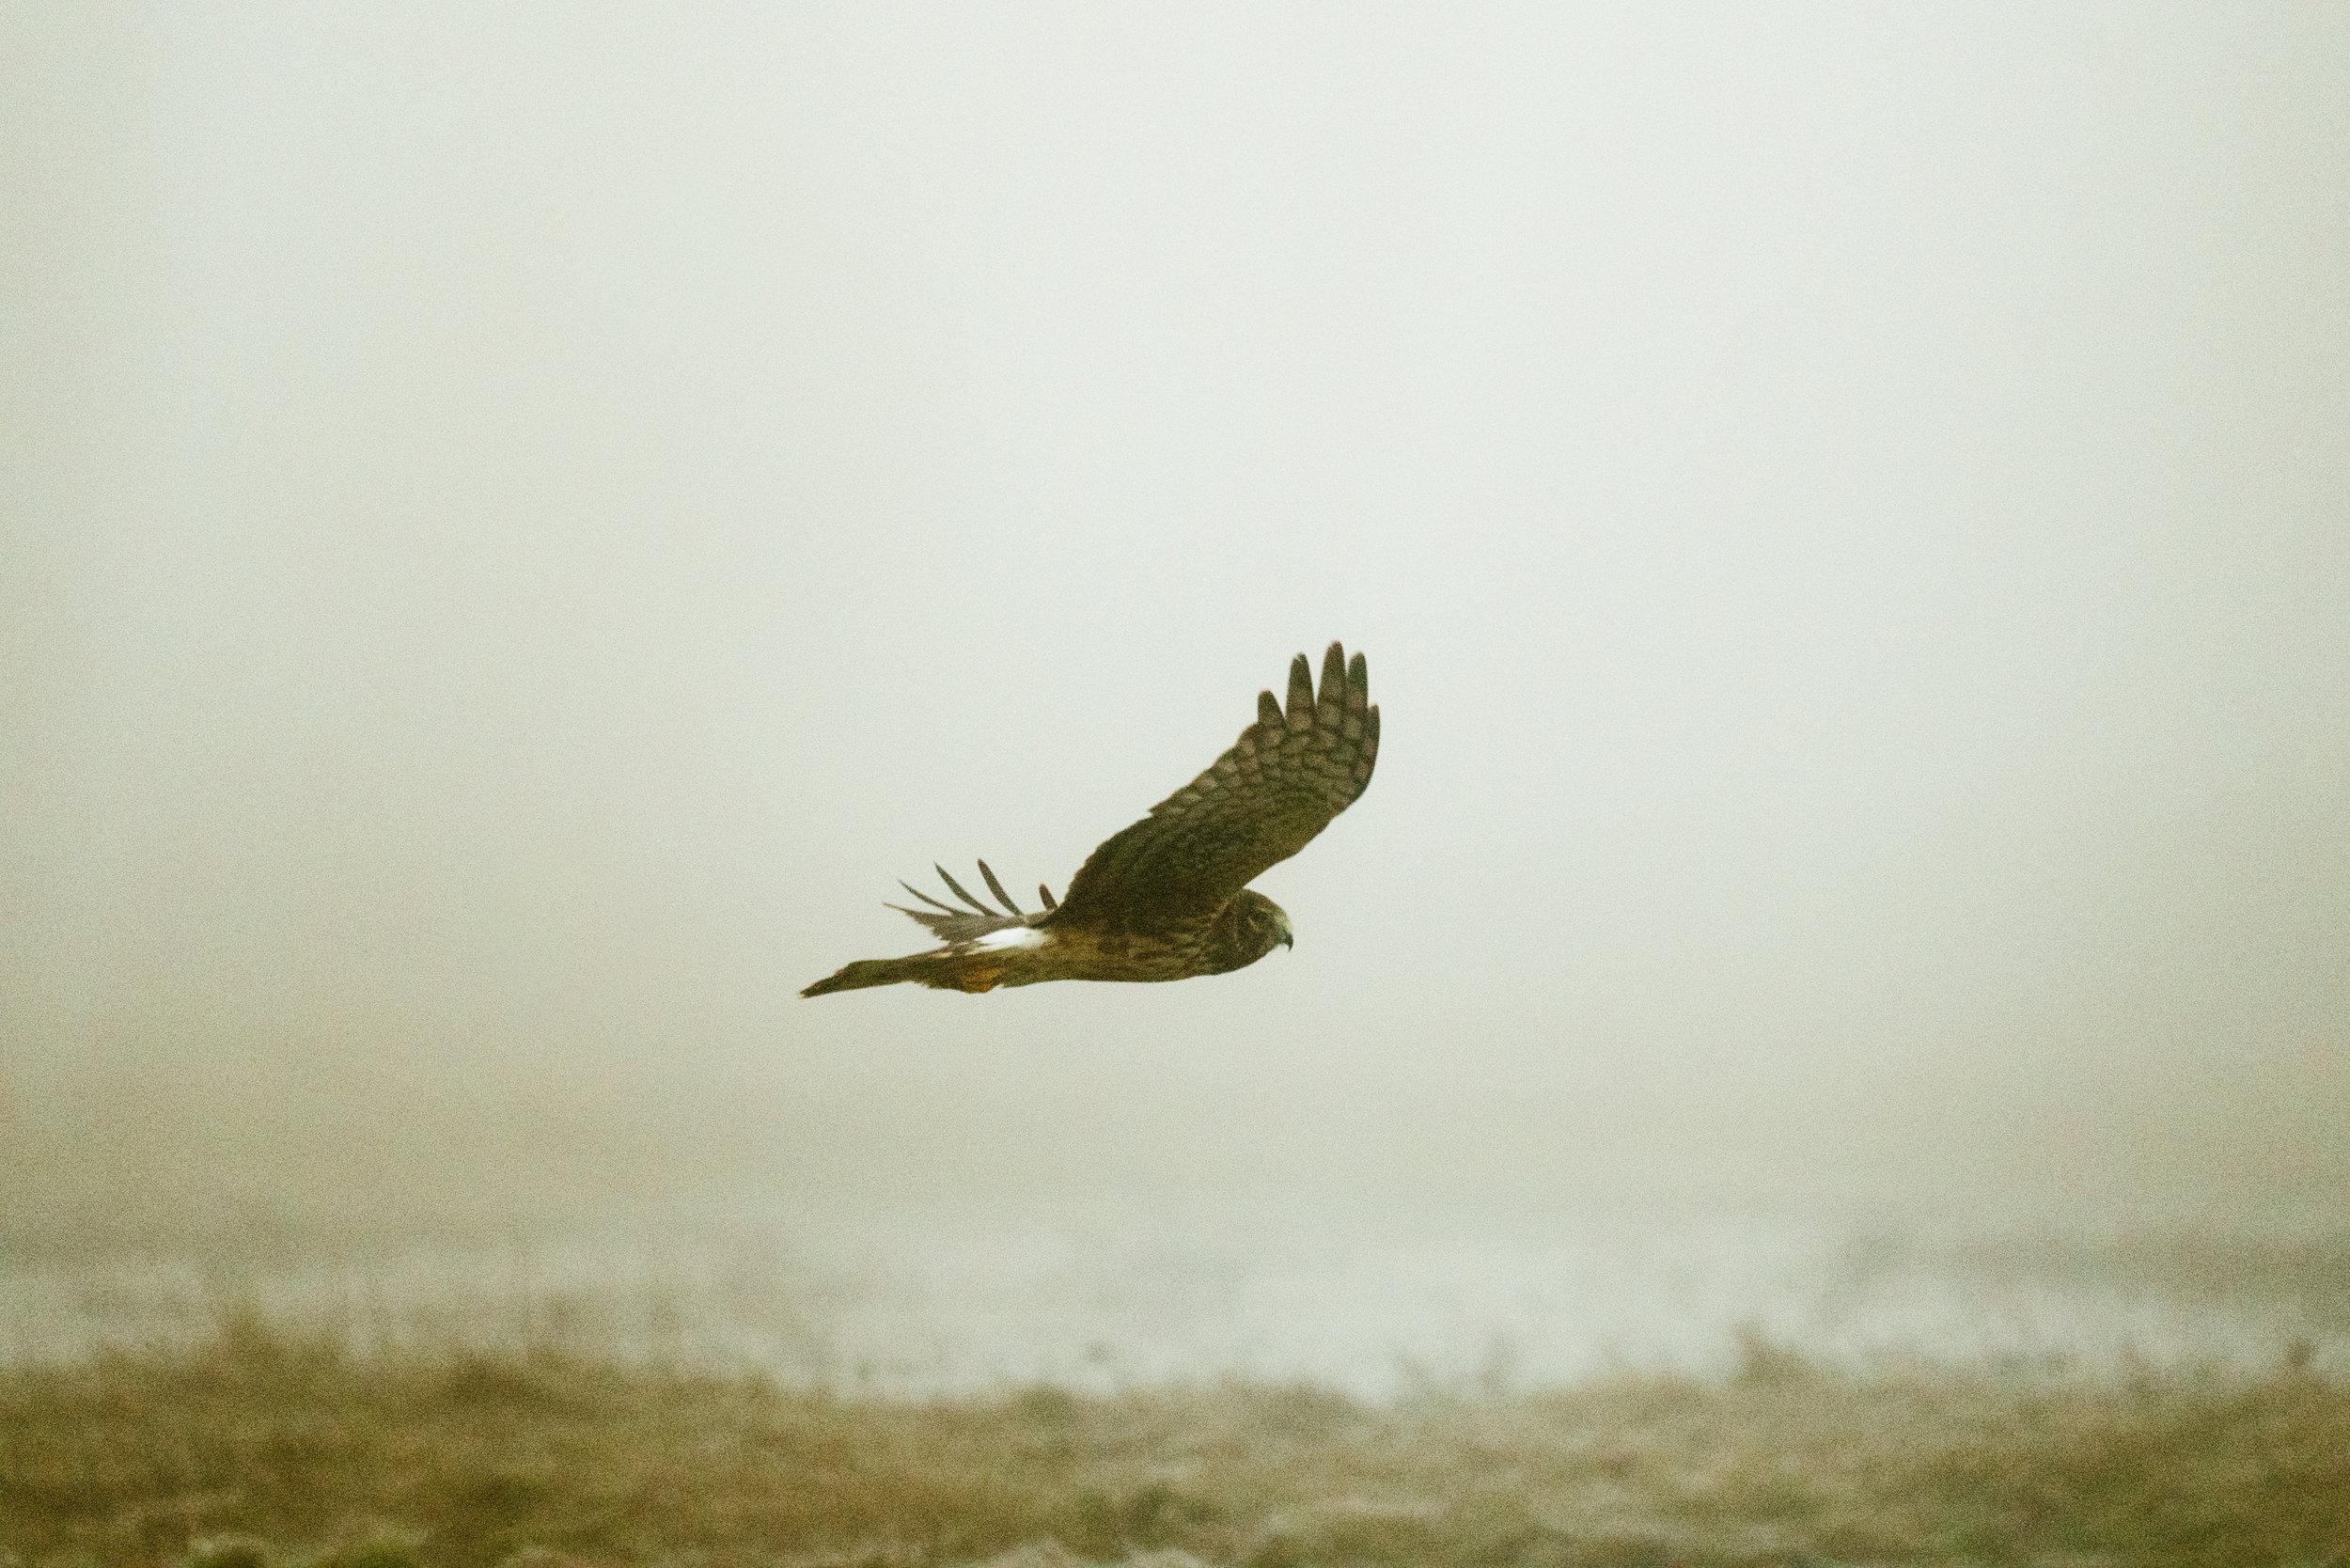 Photograph of a Northern Harrier by Seattle, Washington Wildlife Photographer, Sara Montour Lewis